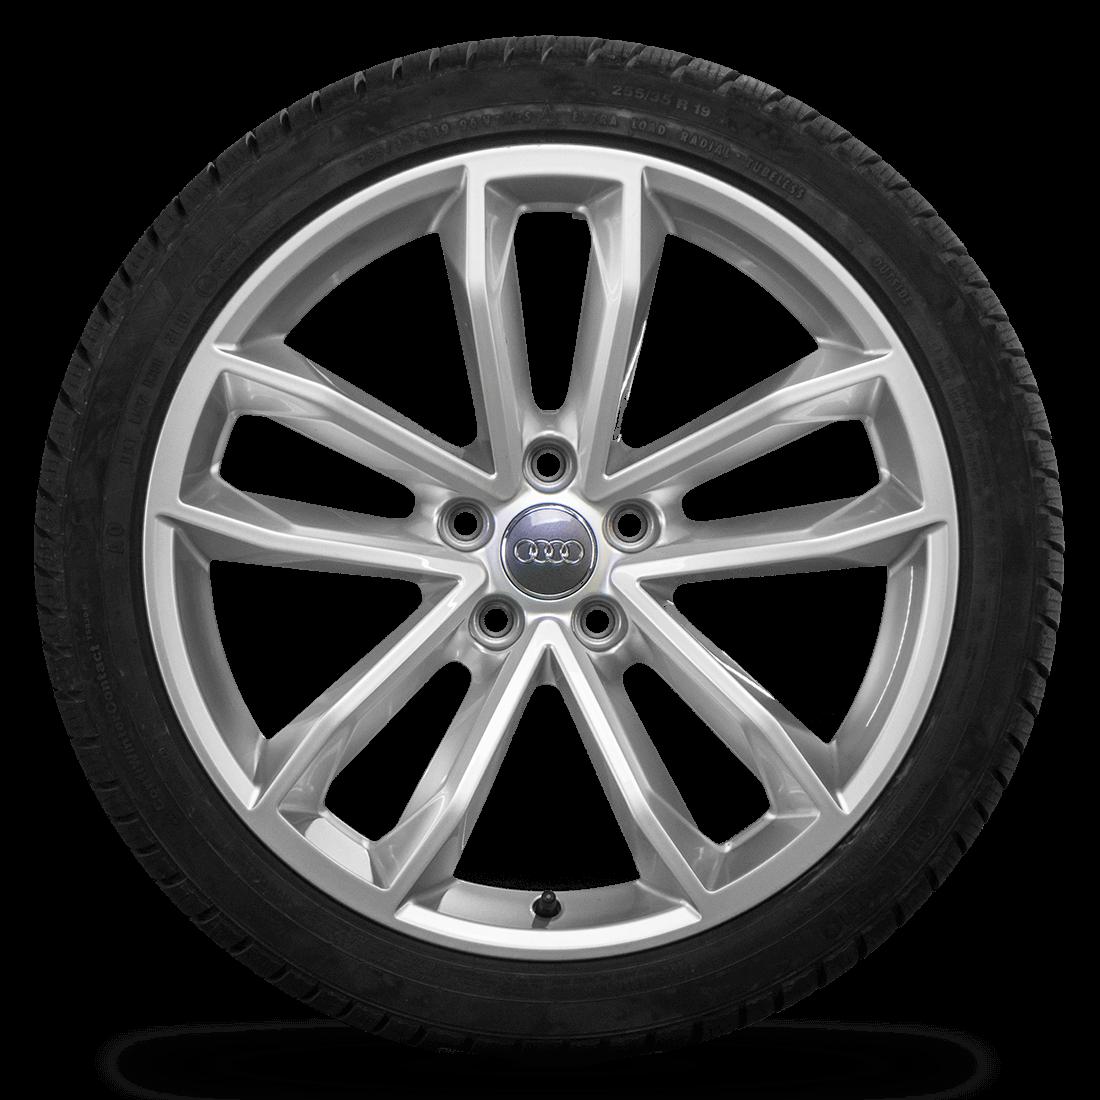 Audi 19 Zoll A5 S5 8W F5 Alufelgen Felgen Winterreifen Winterräder Cavo 8 mm